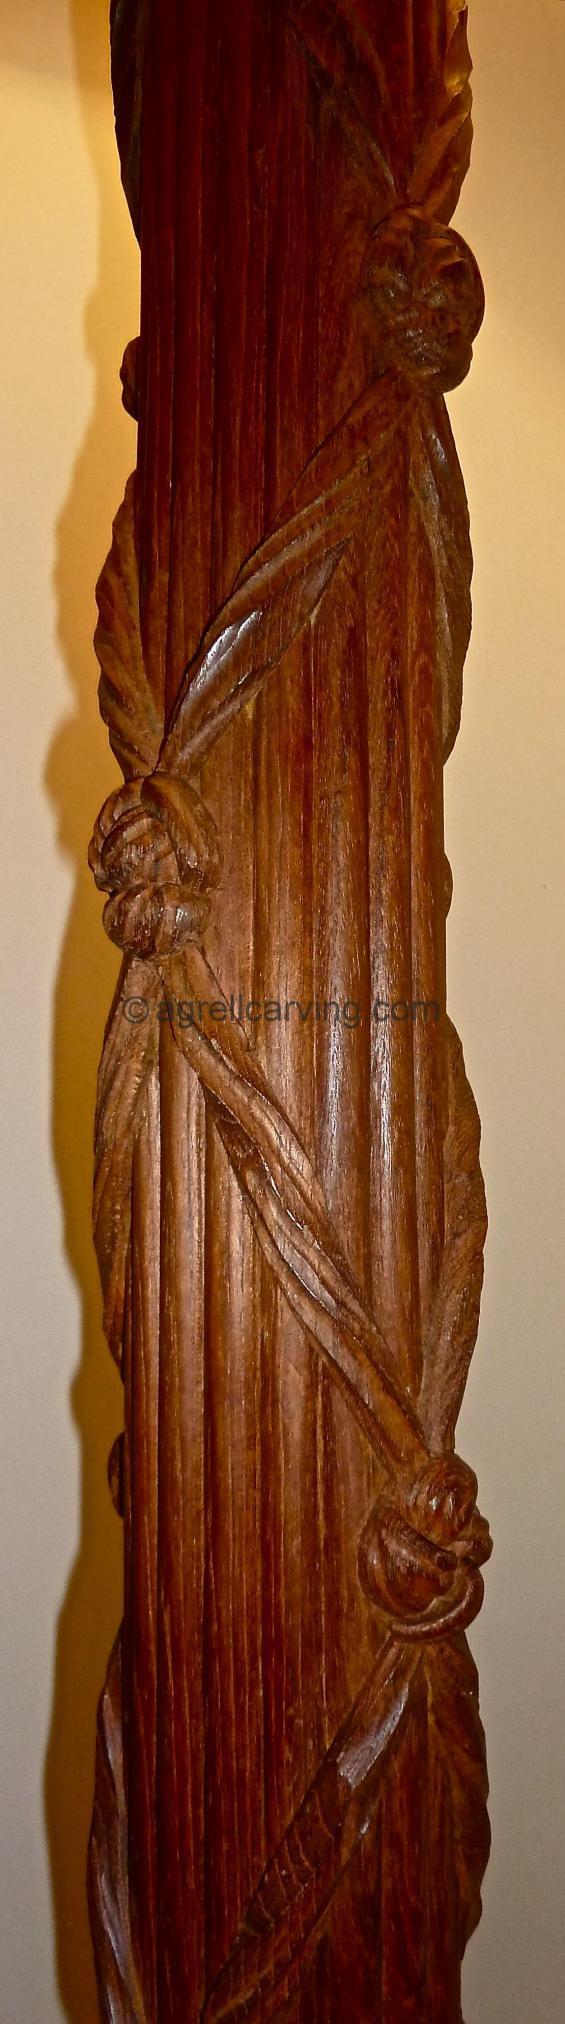 Chippendale column